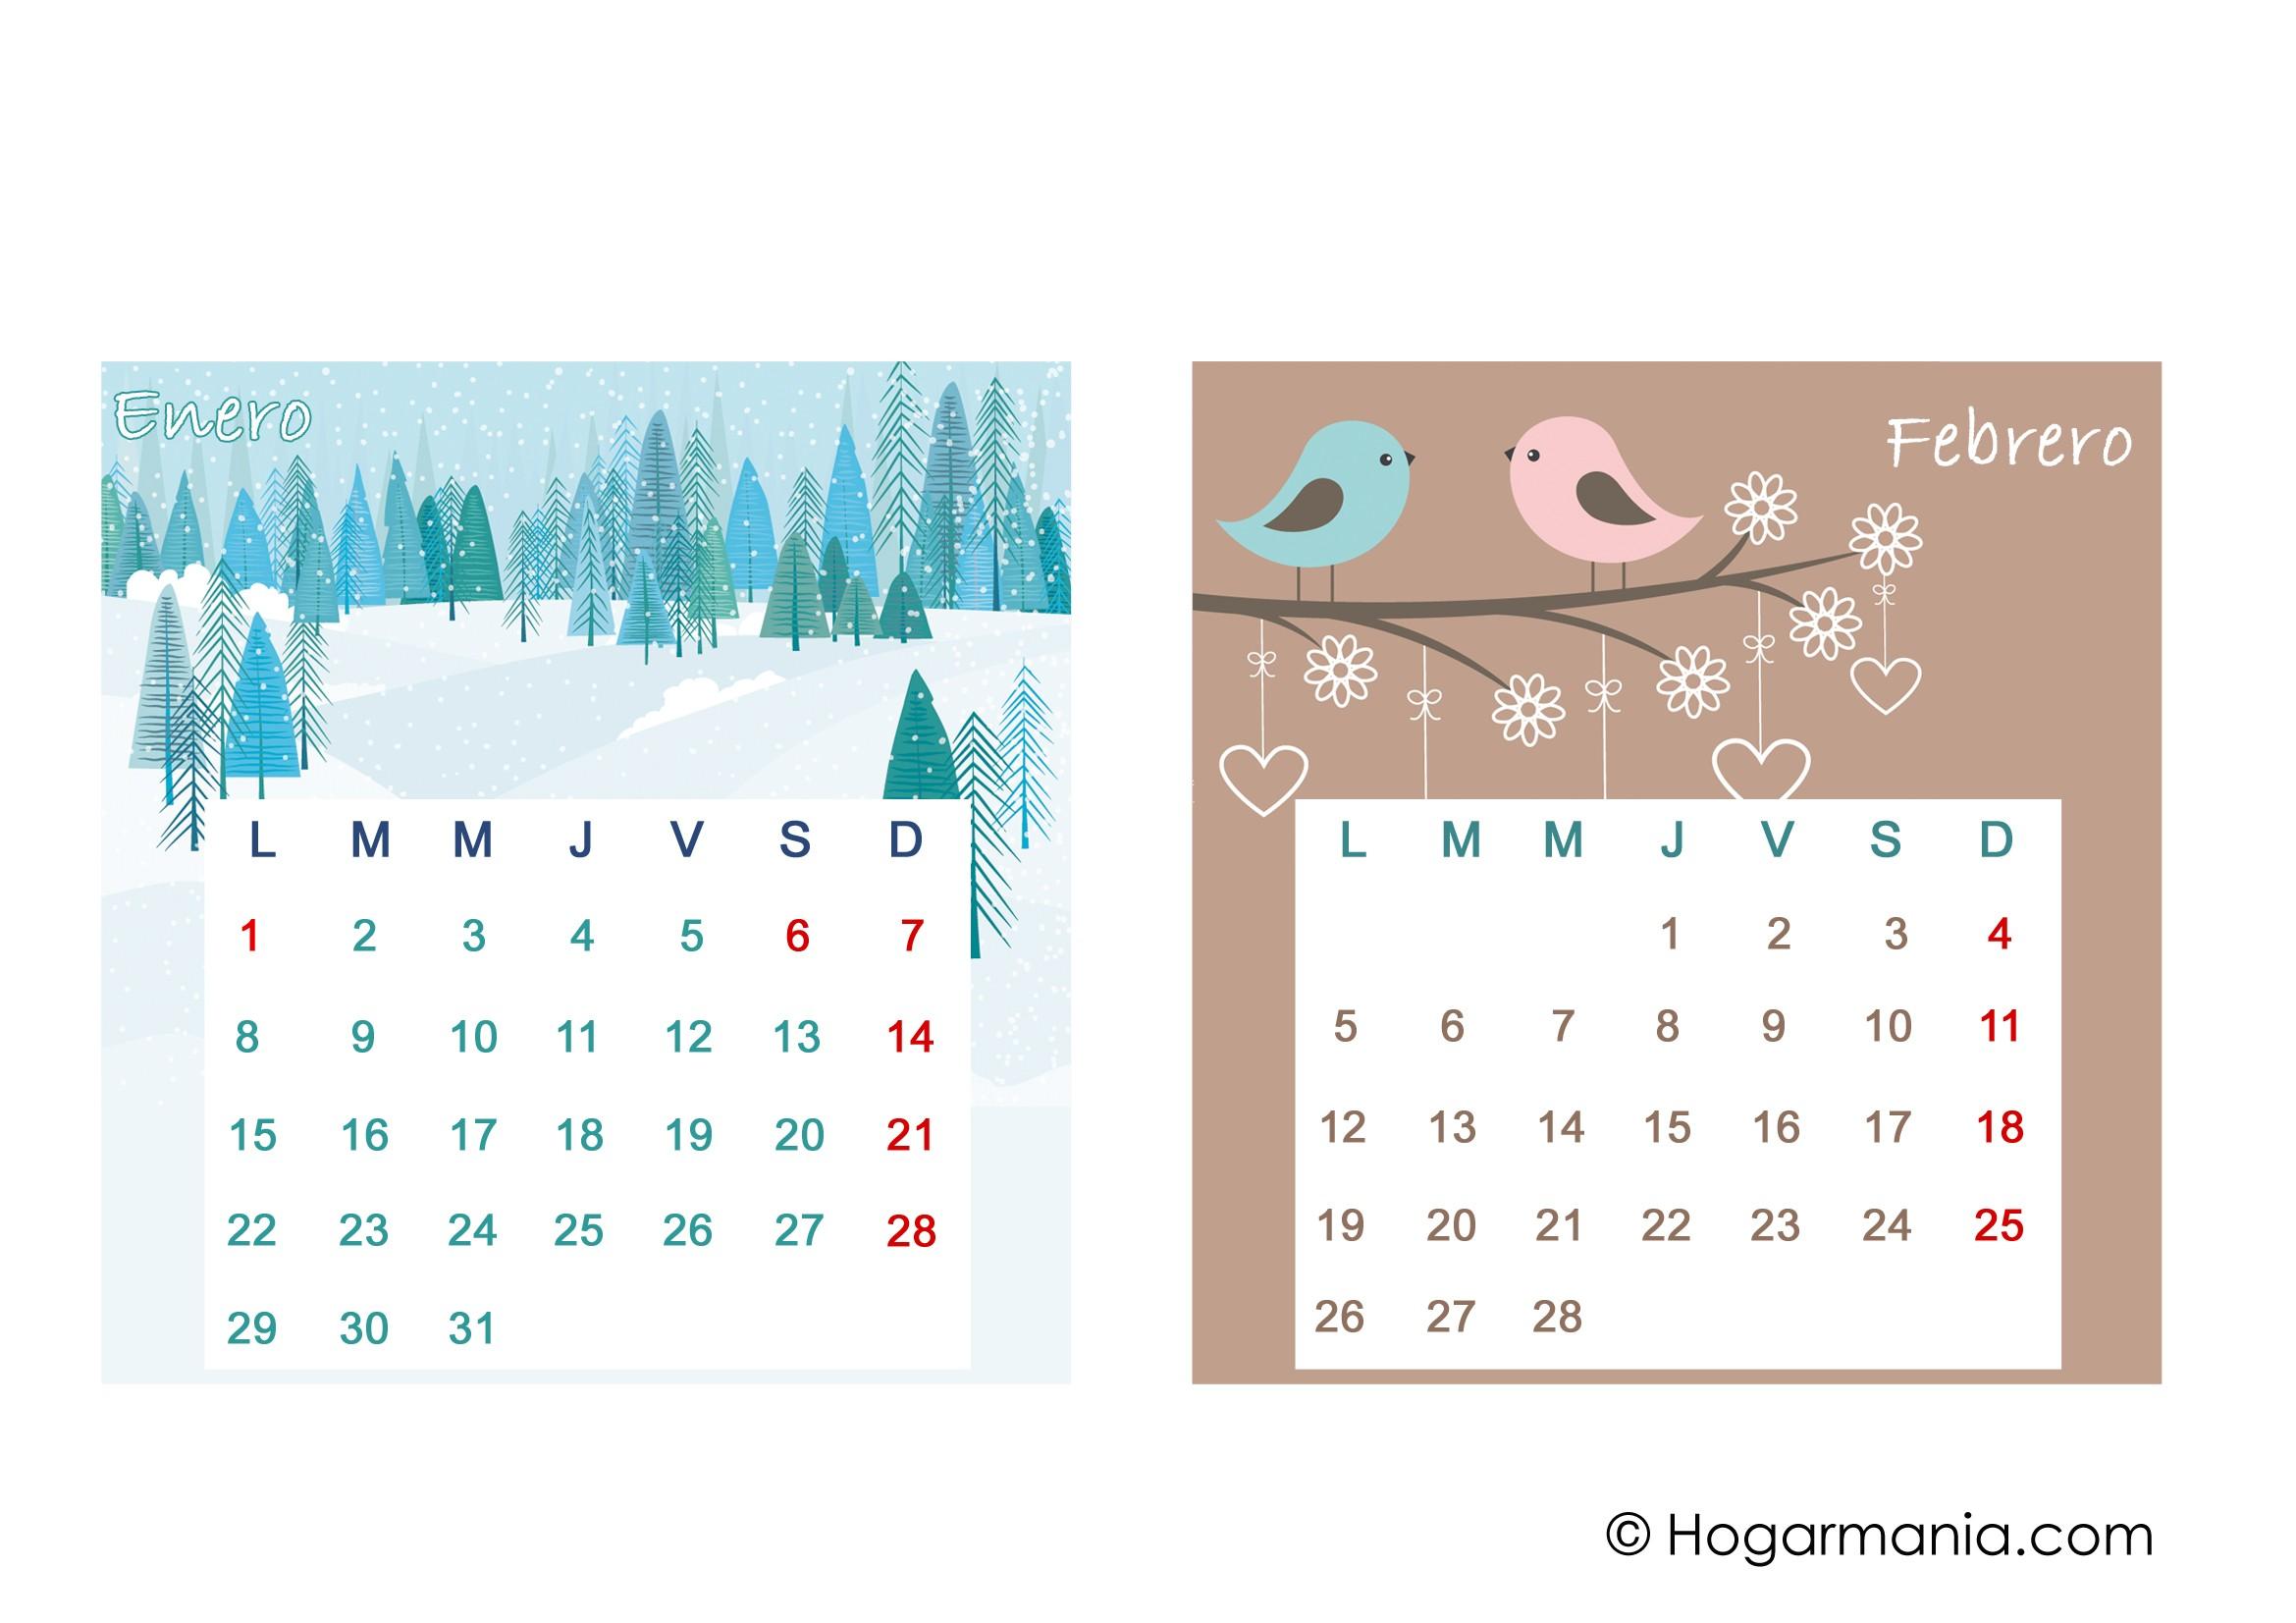 Calendario Liturgico 2018 – newcalendar